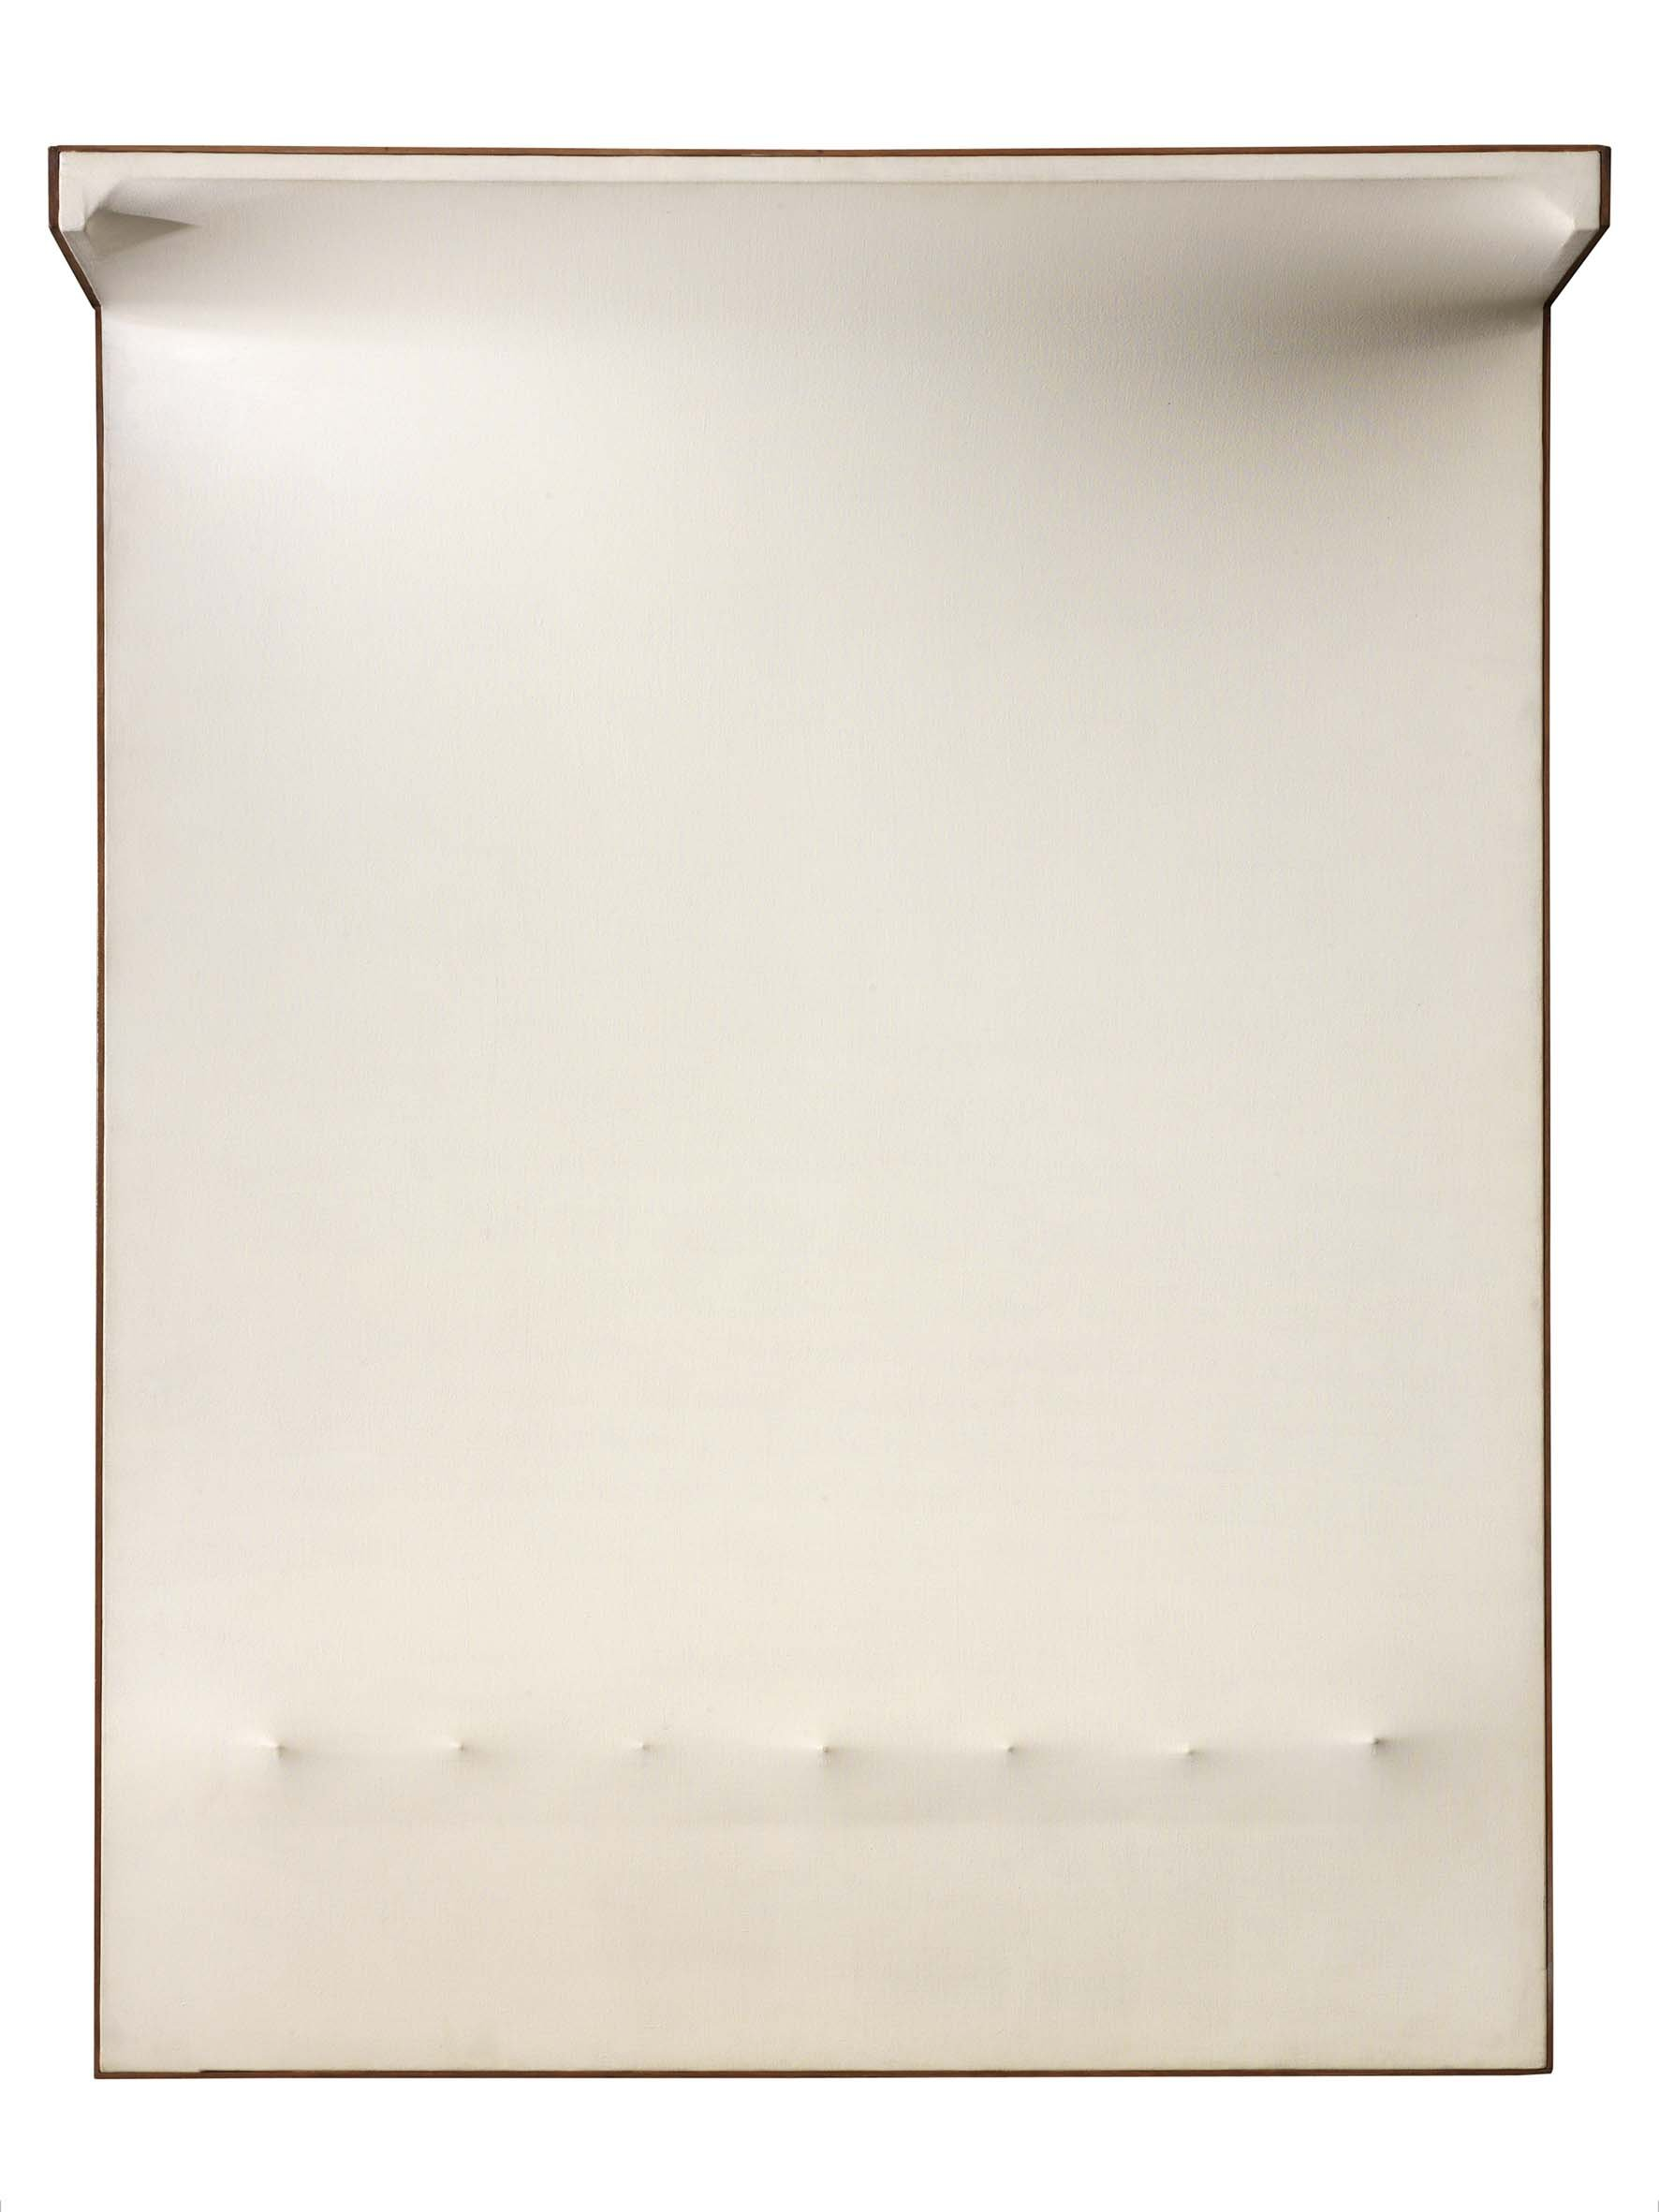 Enrico Castellani, Superficie bianca n°5, 1964, acrilico su tela estroflessa, 146x114x30 cm